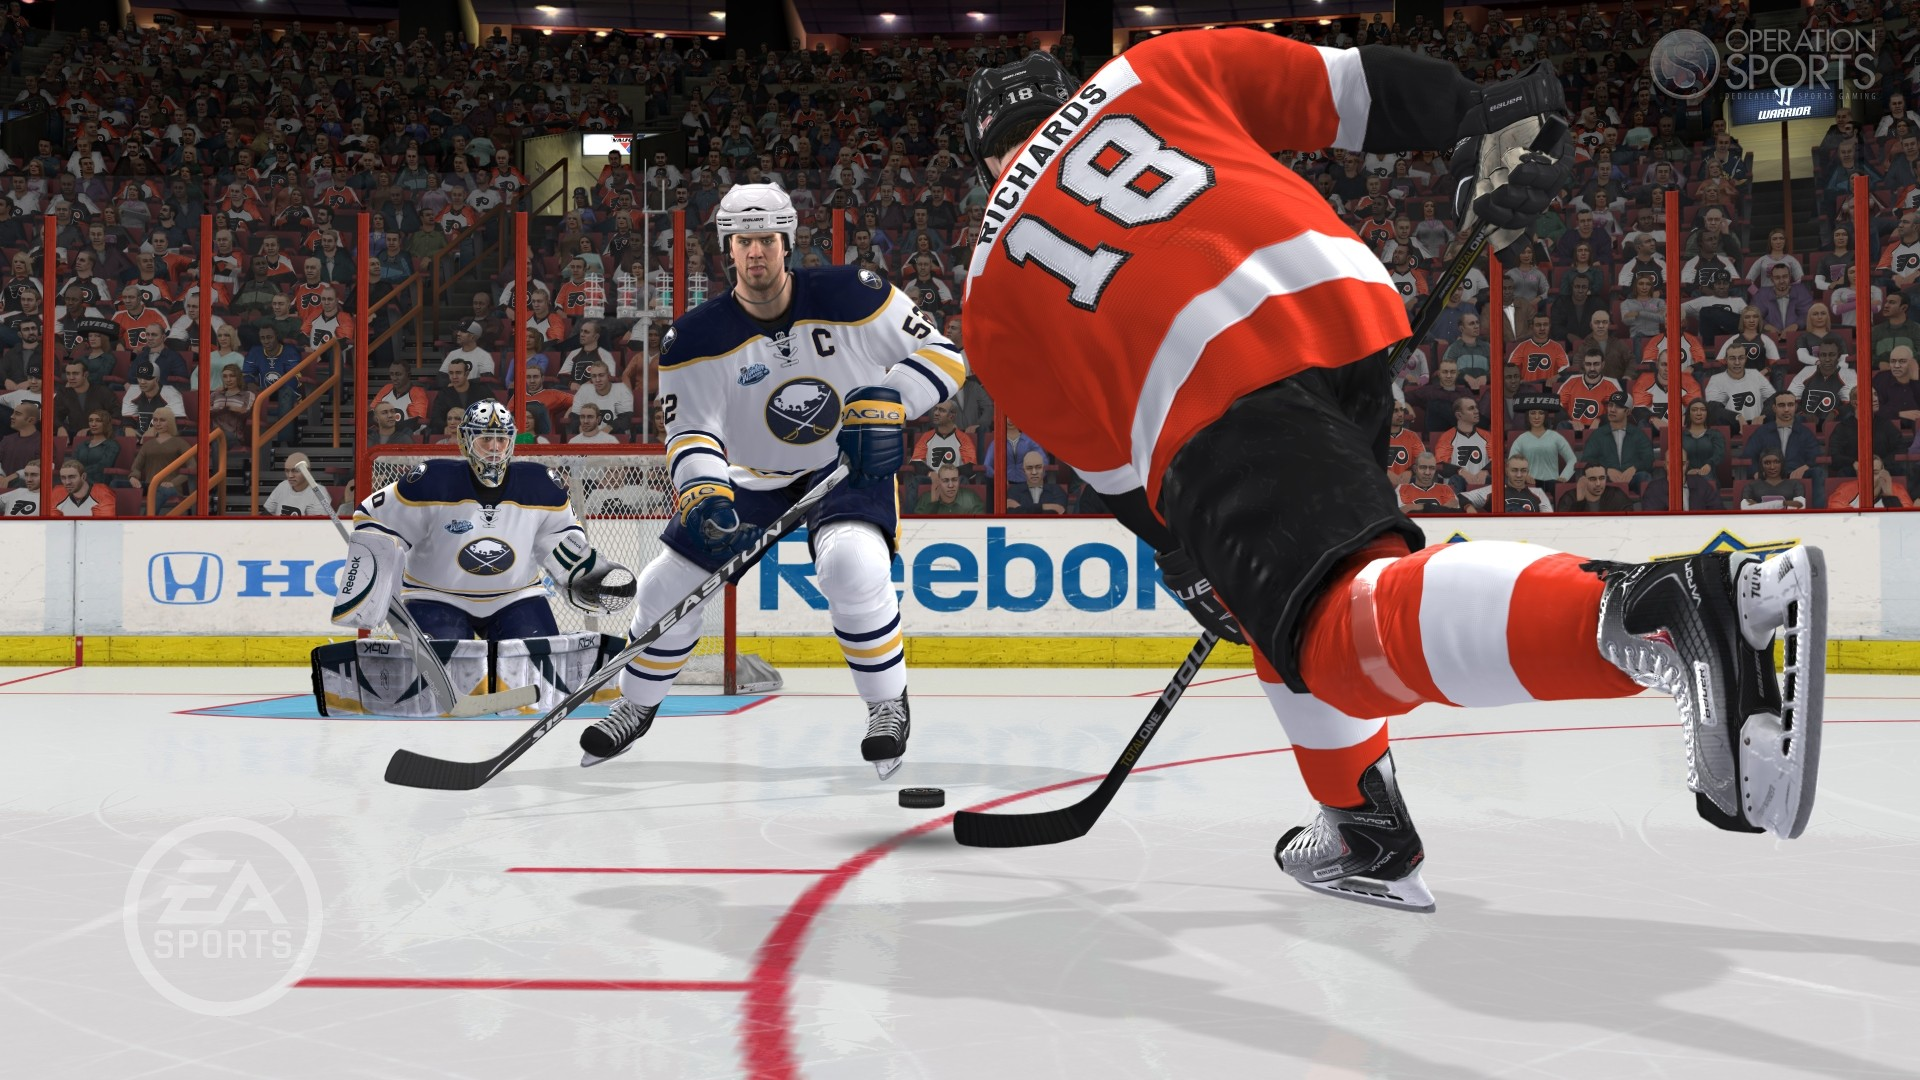 картинки из игры NHL 12